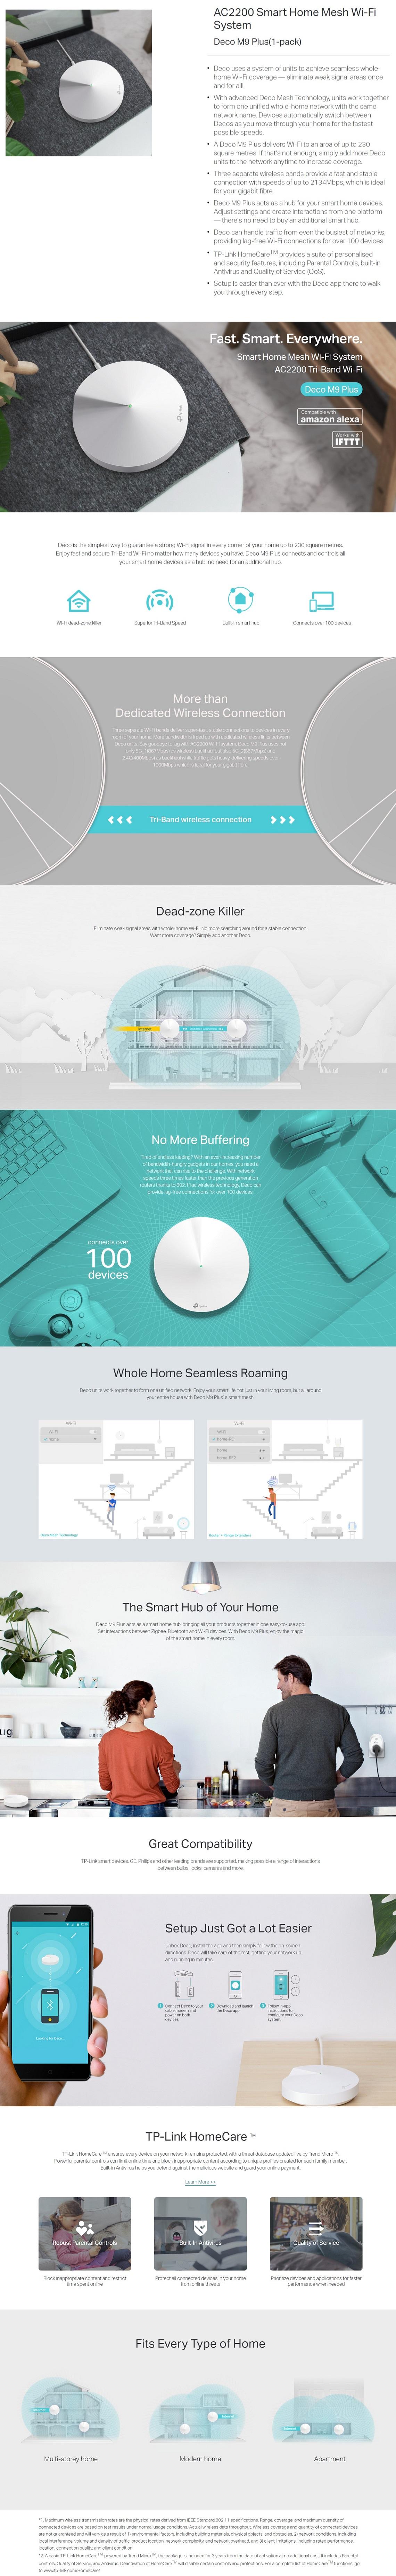 TP-Link Deco M9 Plus 1 Pack AC2200 Smart Home Mesh Wi-Fi System TP-Link Homecare